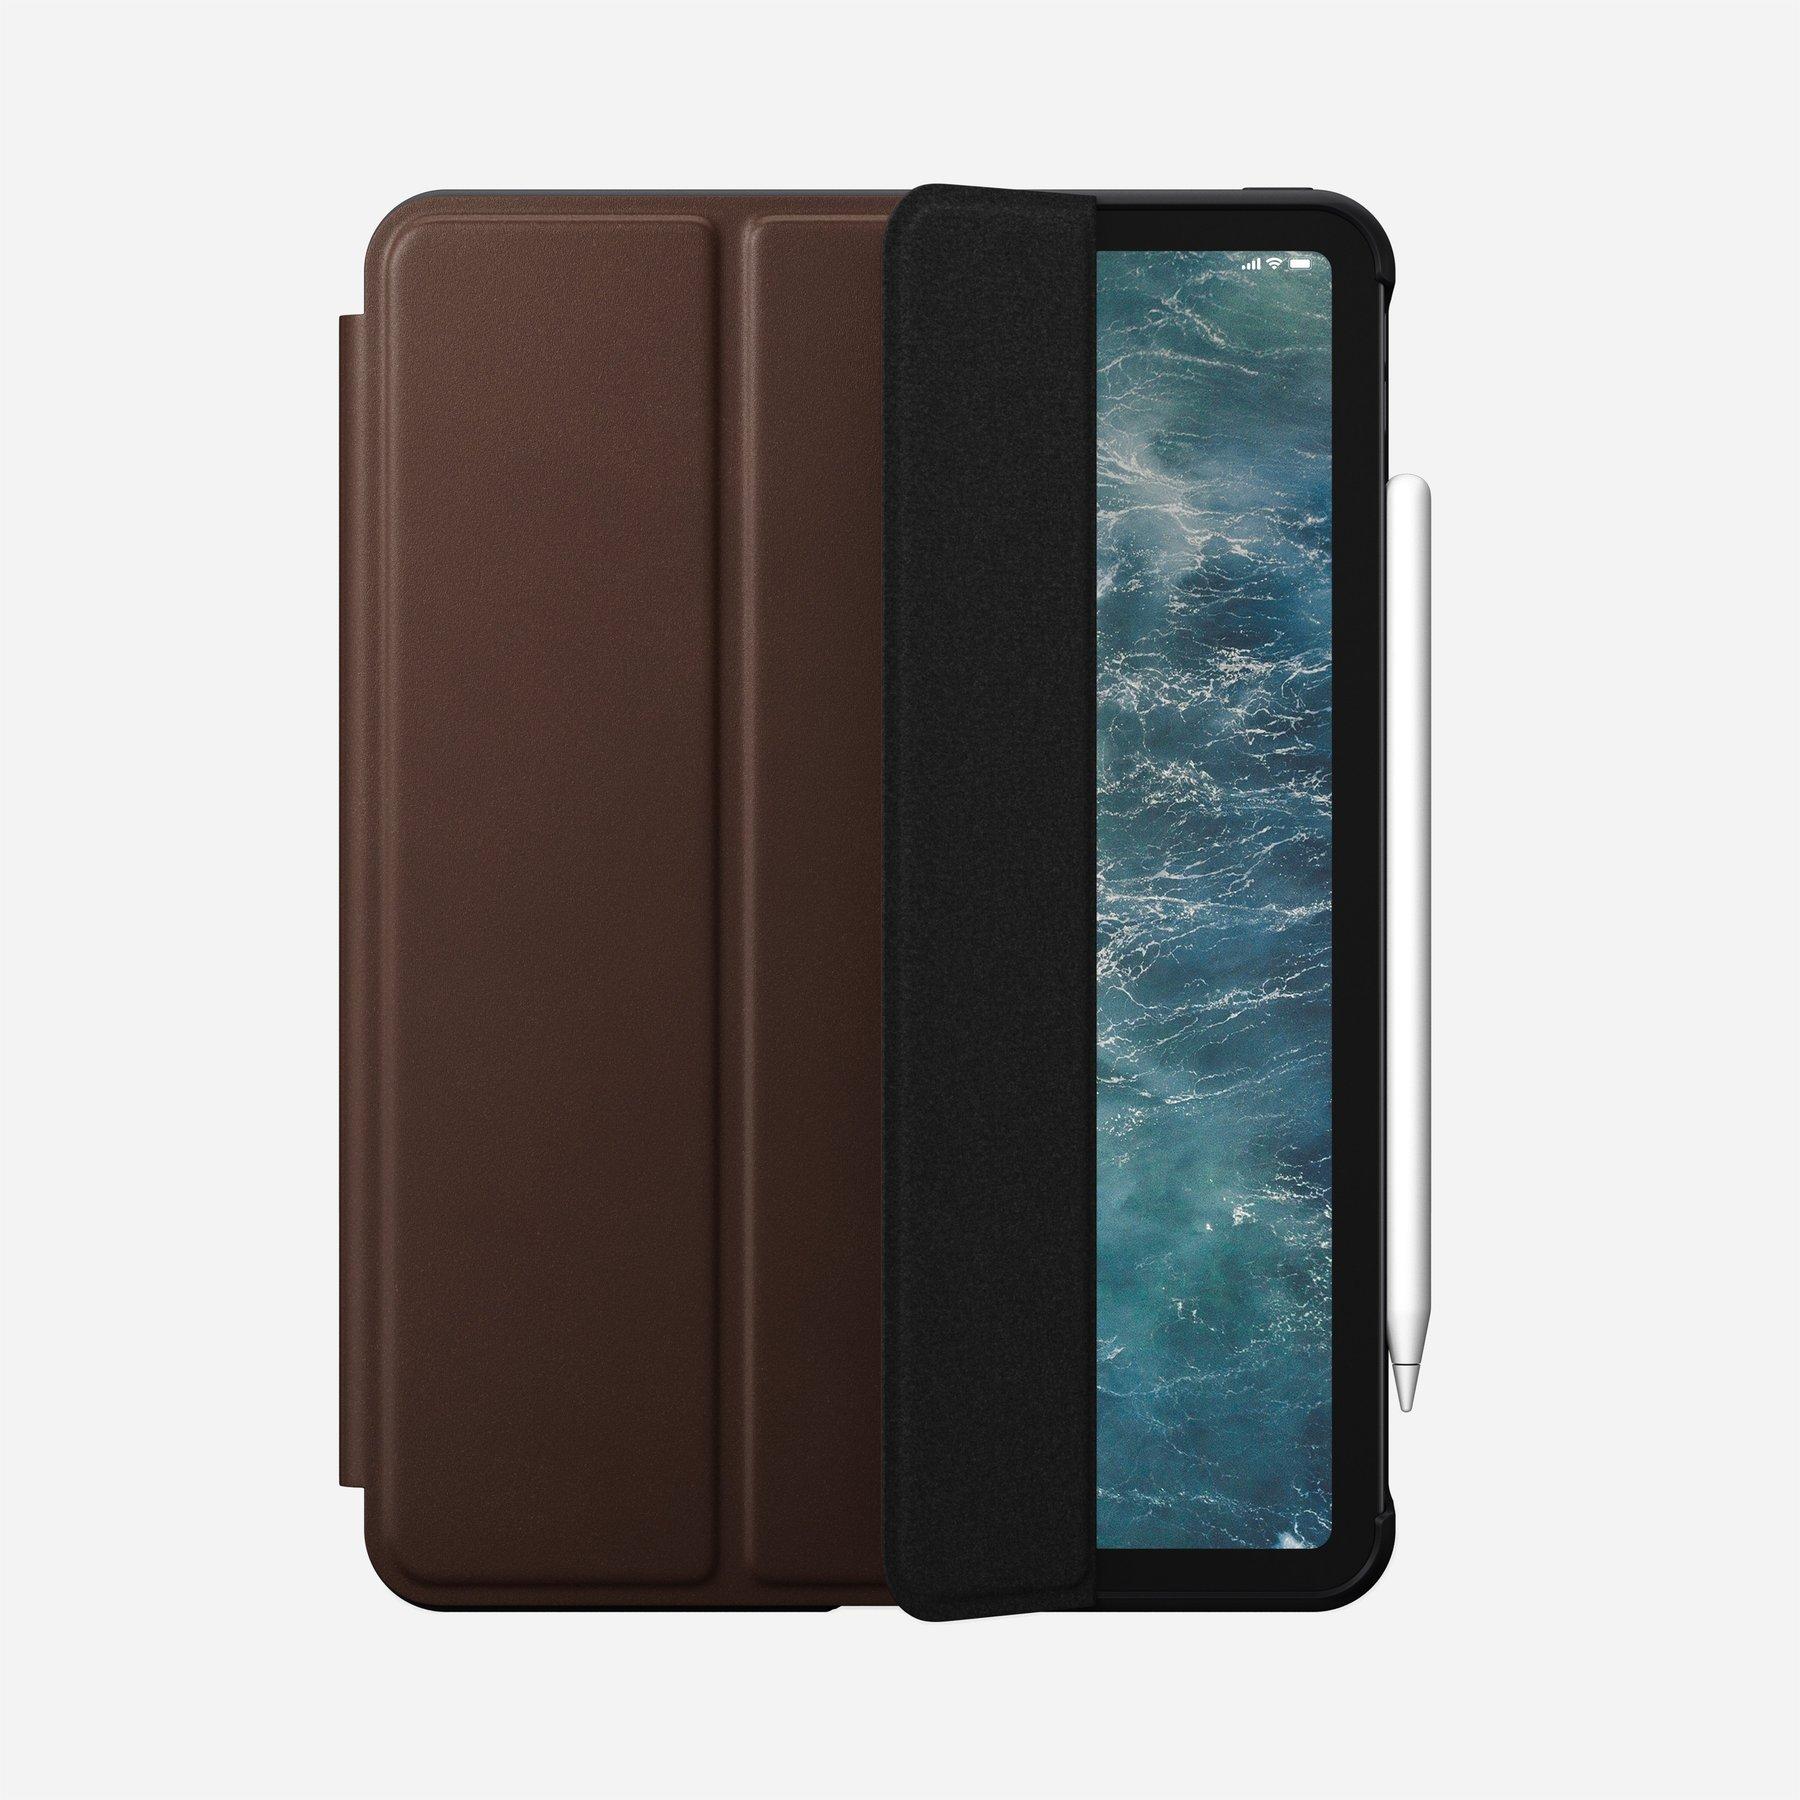 "Nomad Rugged Leather Folio Case für iPad Pro 11"" Rustic Brown"